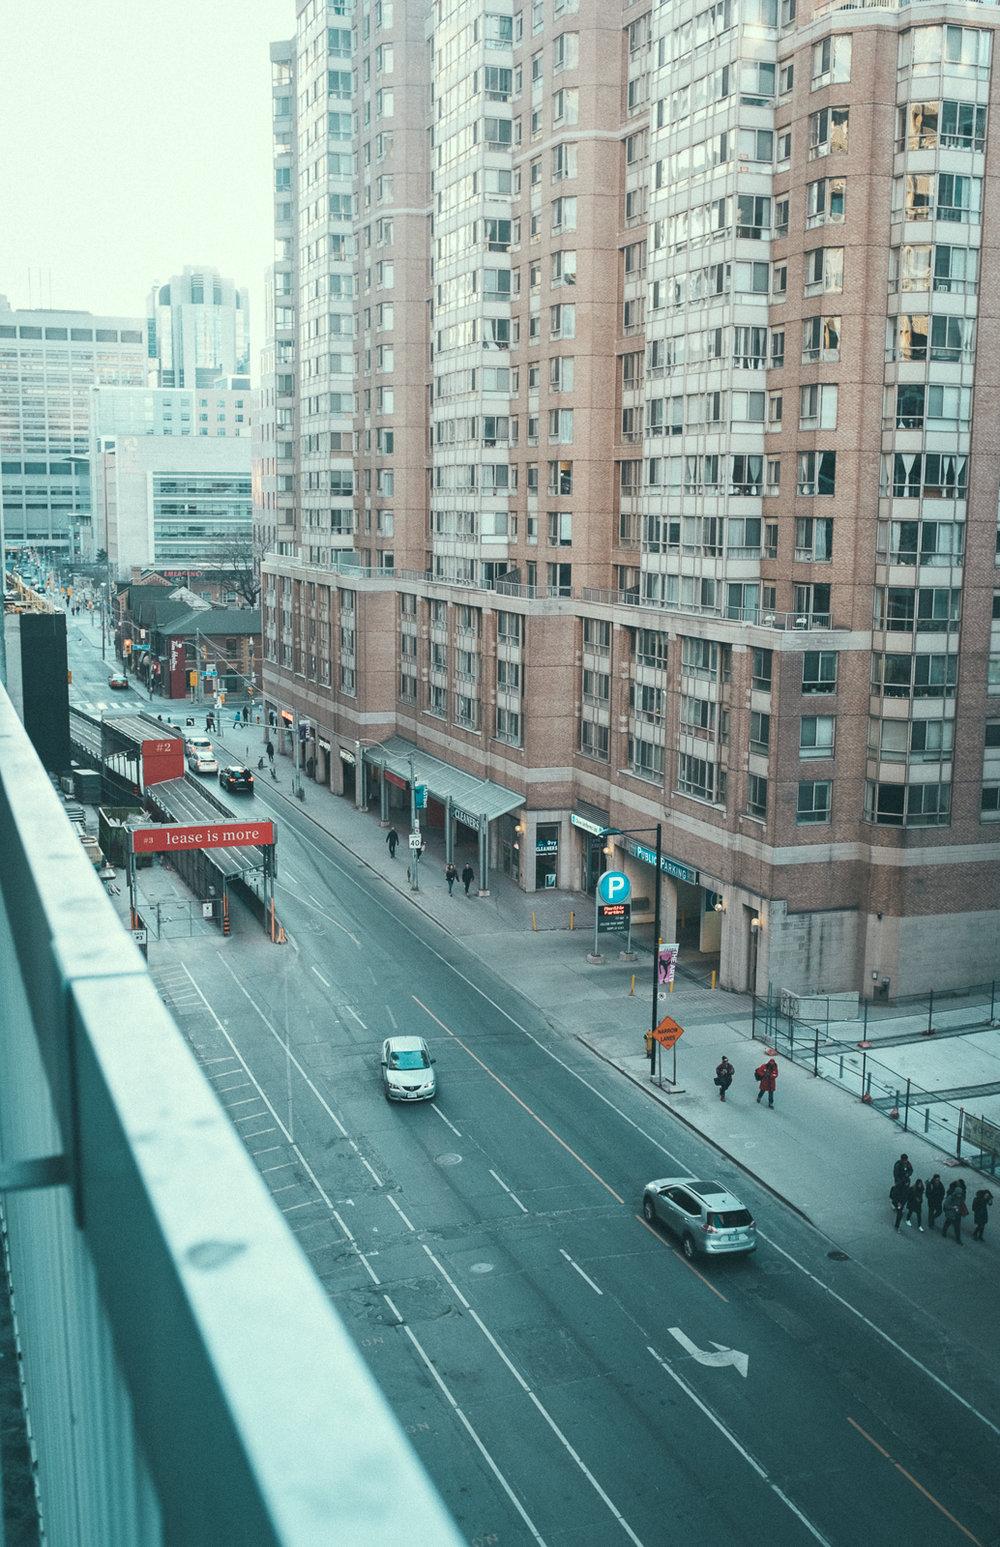 toronto_street-5.jpg